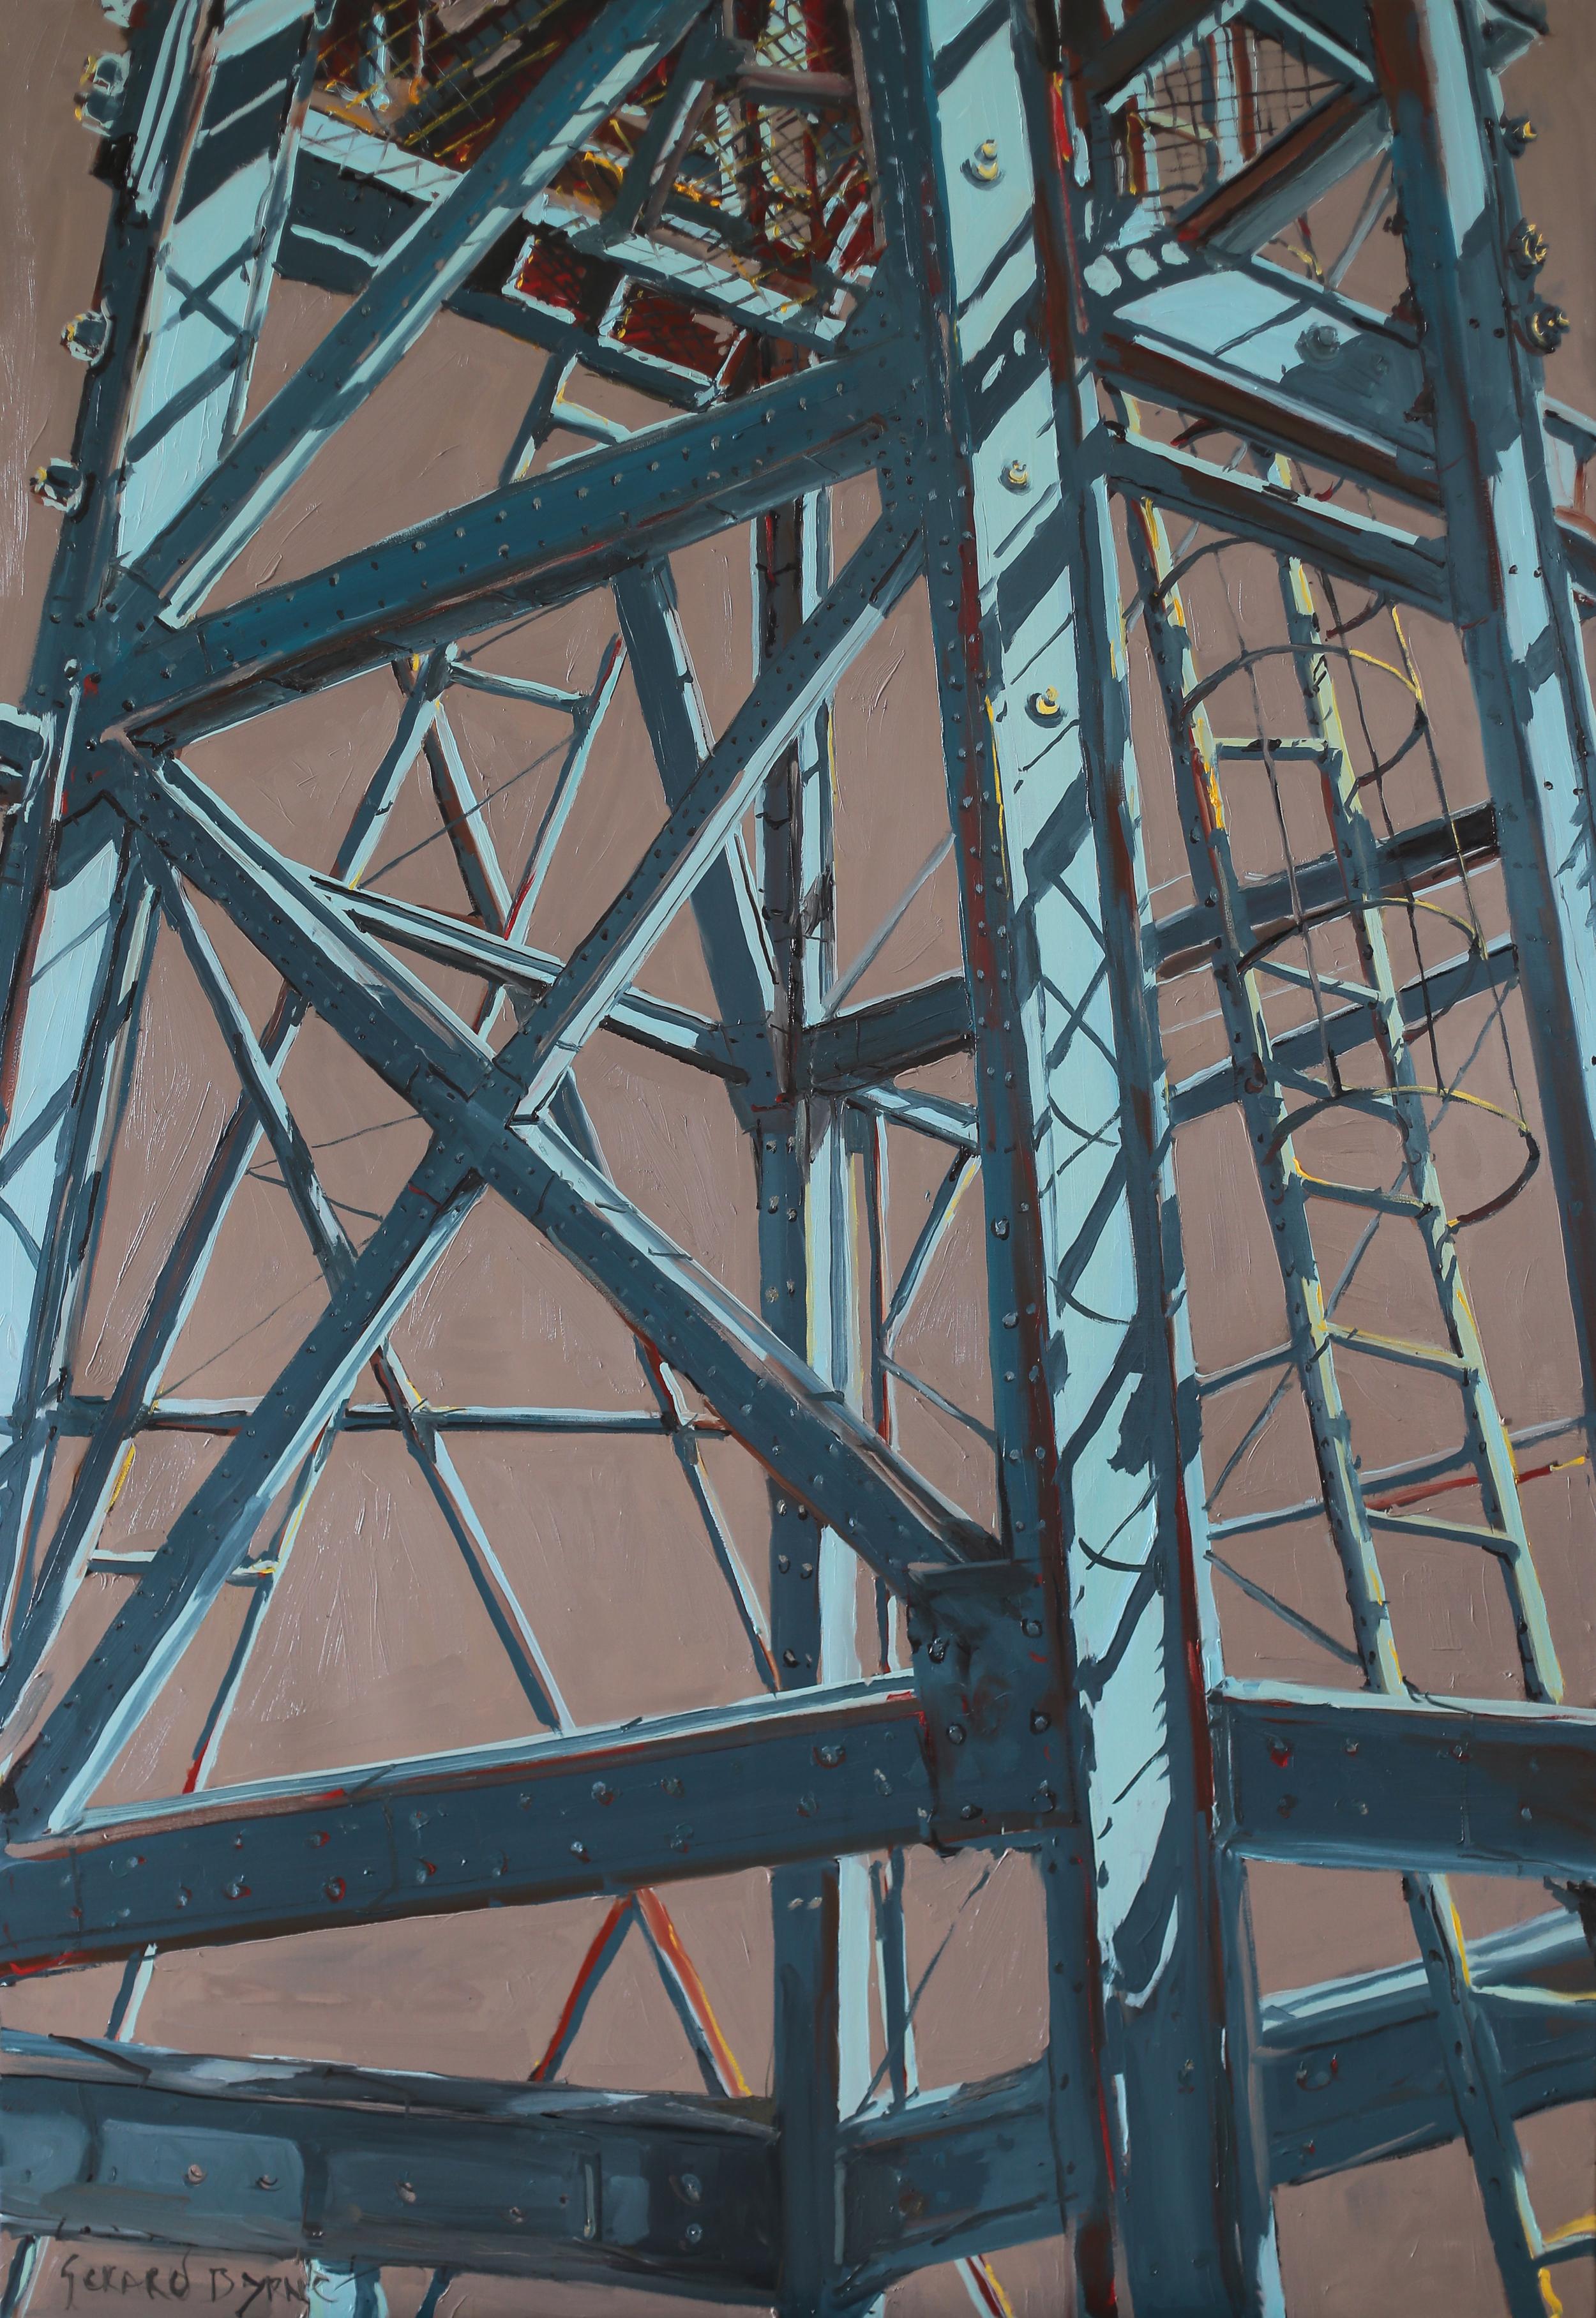 Gerard_Byrne_City_Ladder_oil_on_canvas_116x166cm_The_Art_of_Regeneration_London.jpg